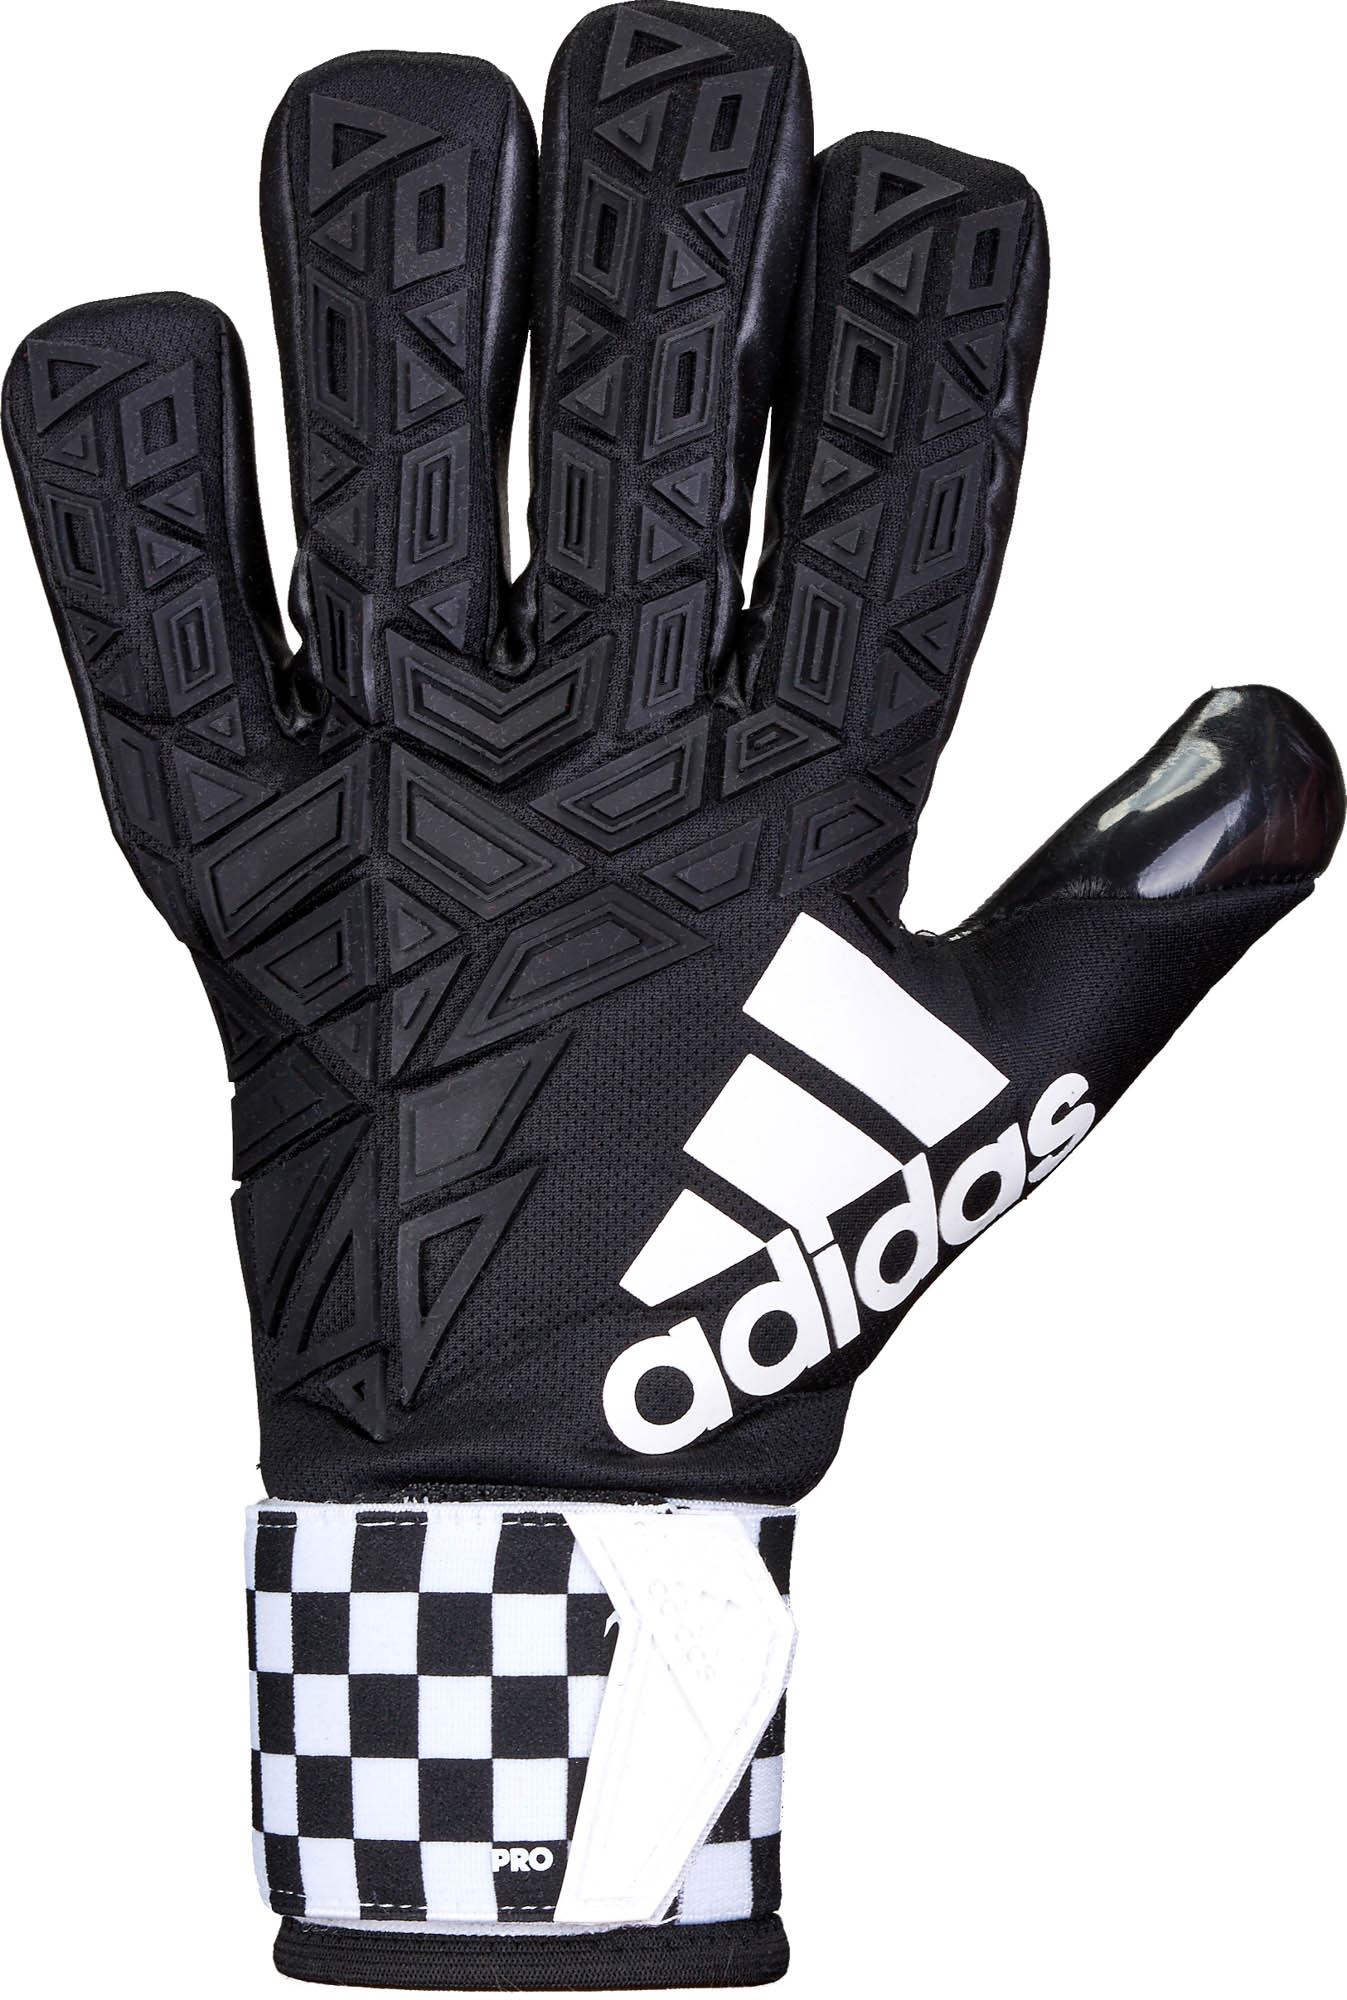 White Black adidas ACE Trans Pro Goalie Gloves